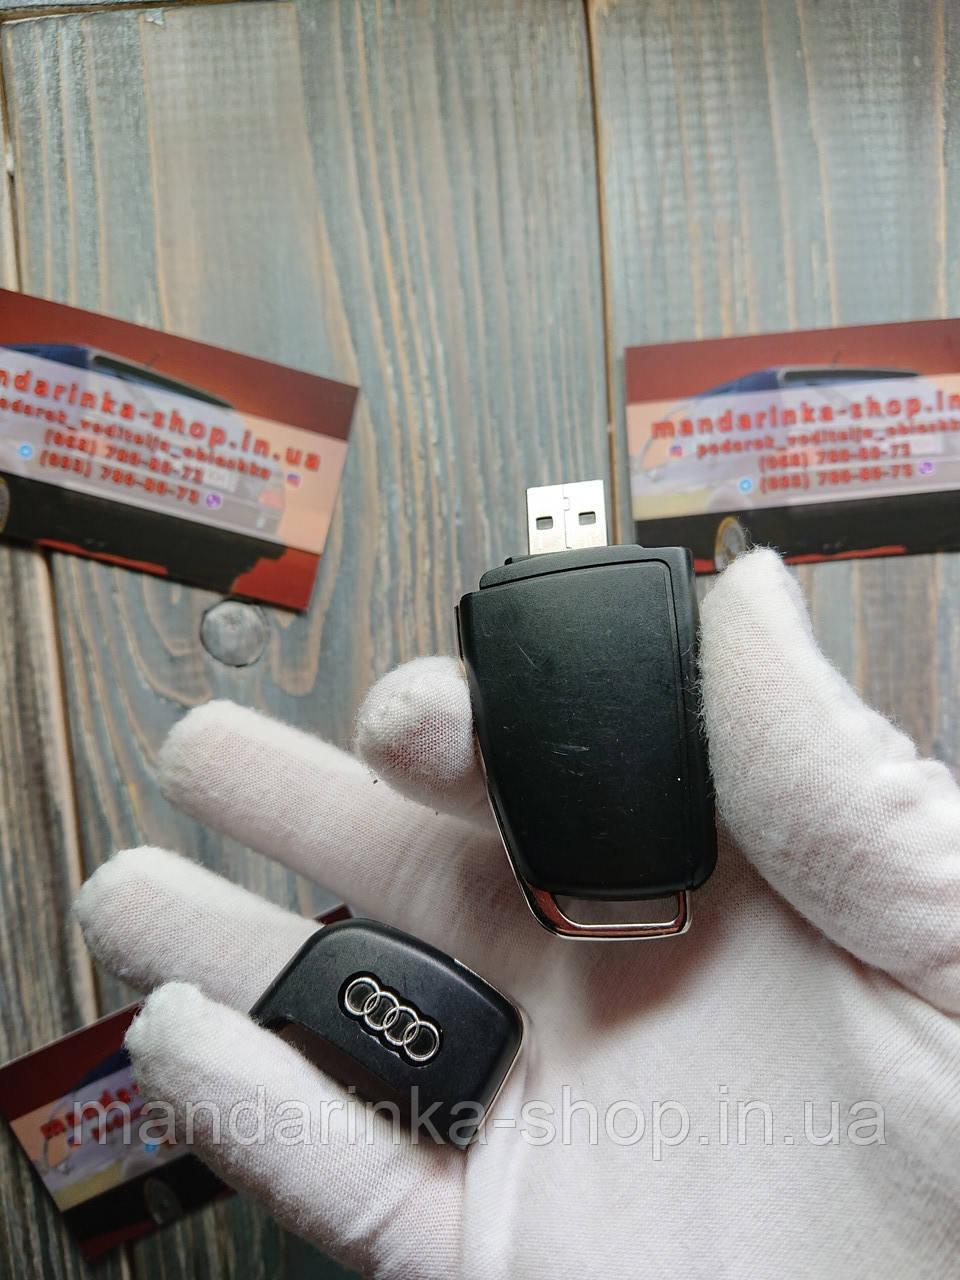 Флешка с логотипом Audi (Ауди) 32 Гб